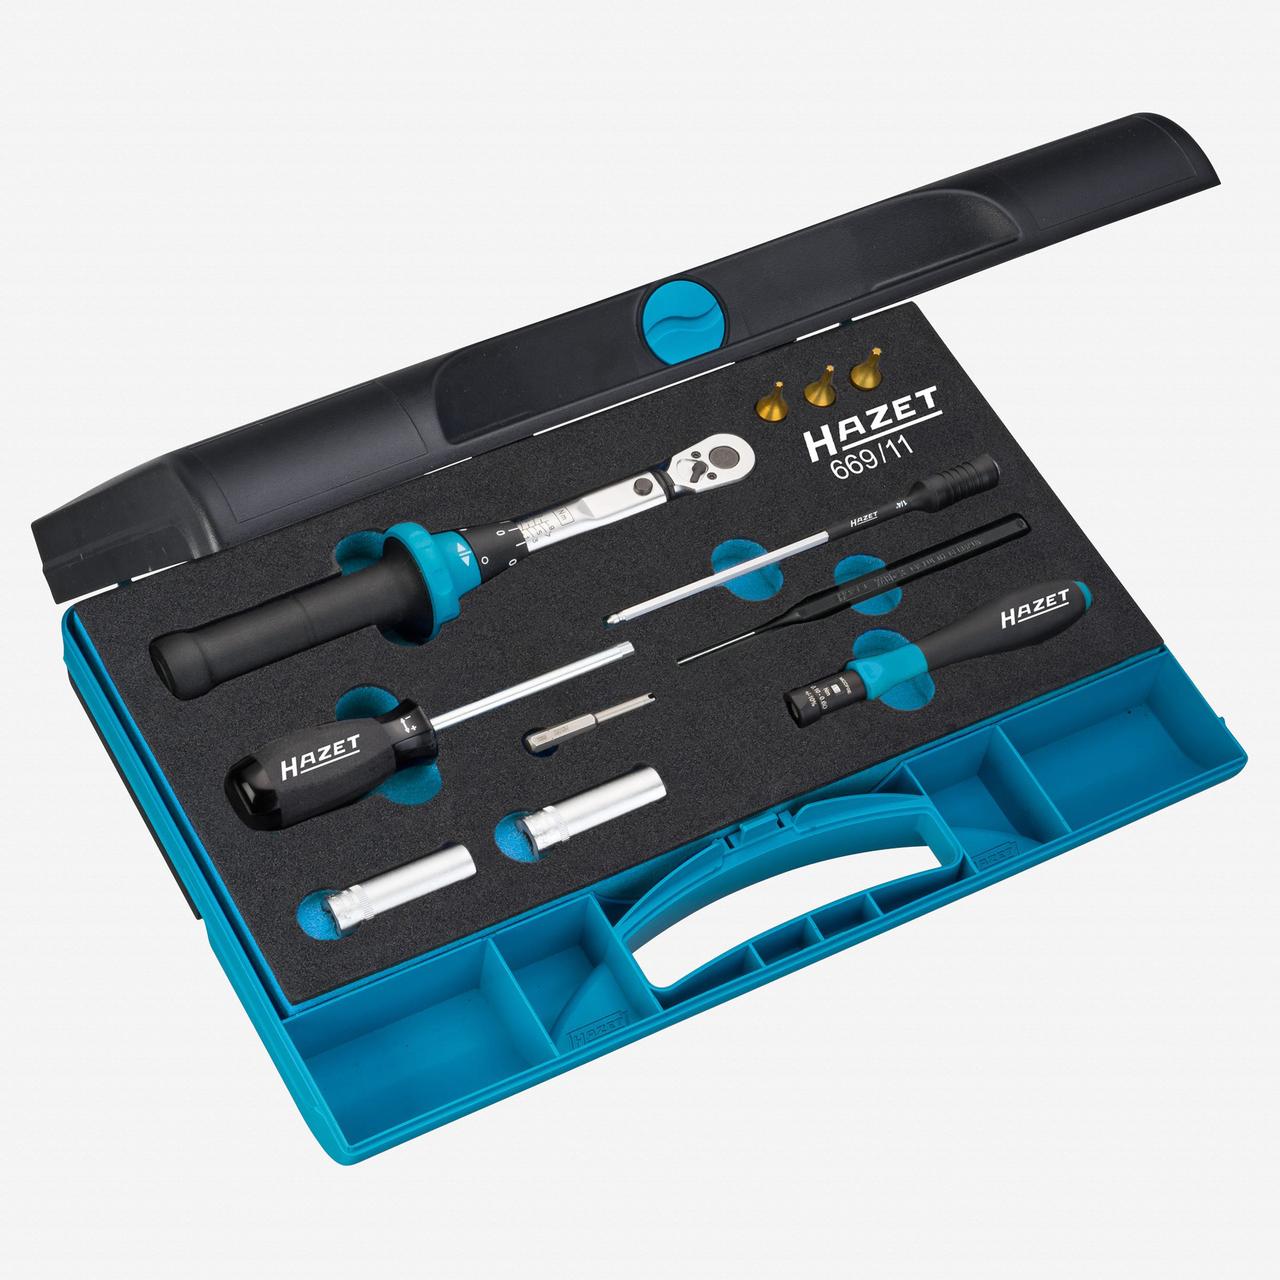 Hazet 669/11 Tyre pressure control system tool set (TPMS) 0.1 - 9 Nm  - KC Tool